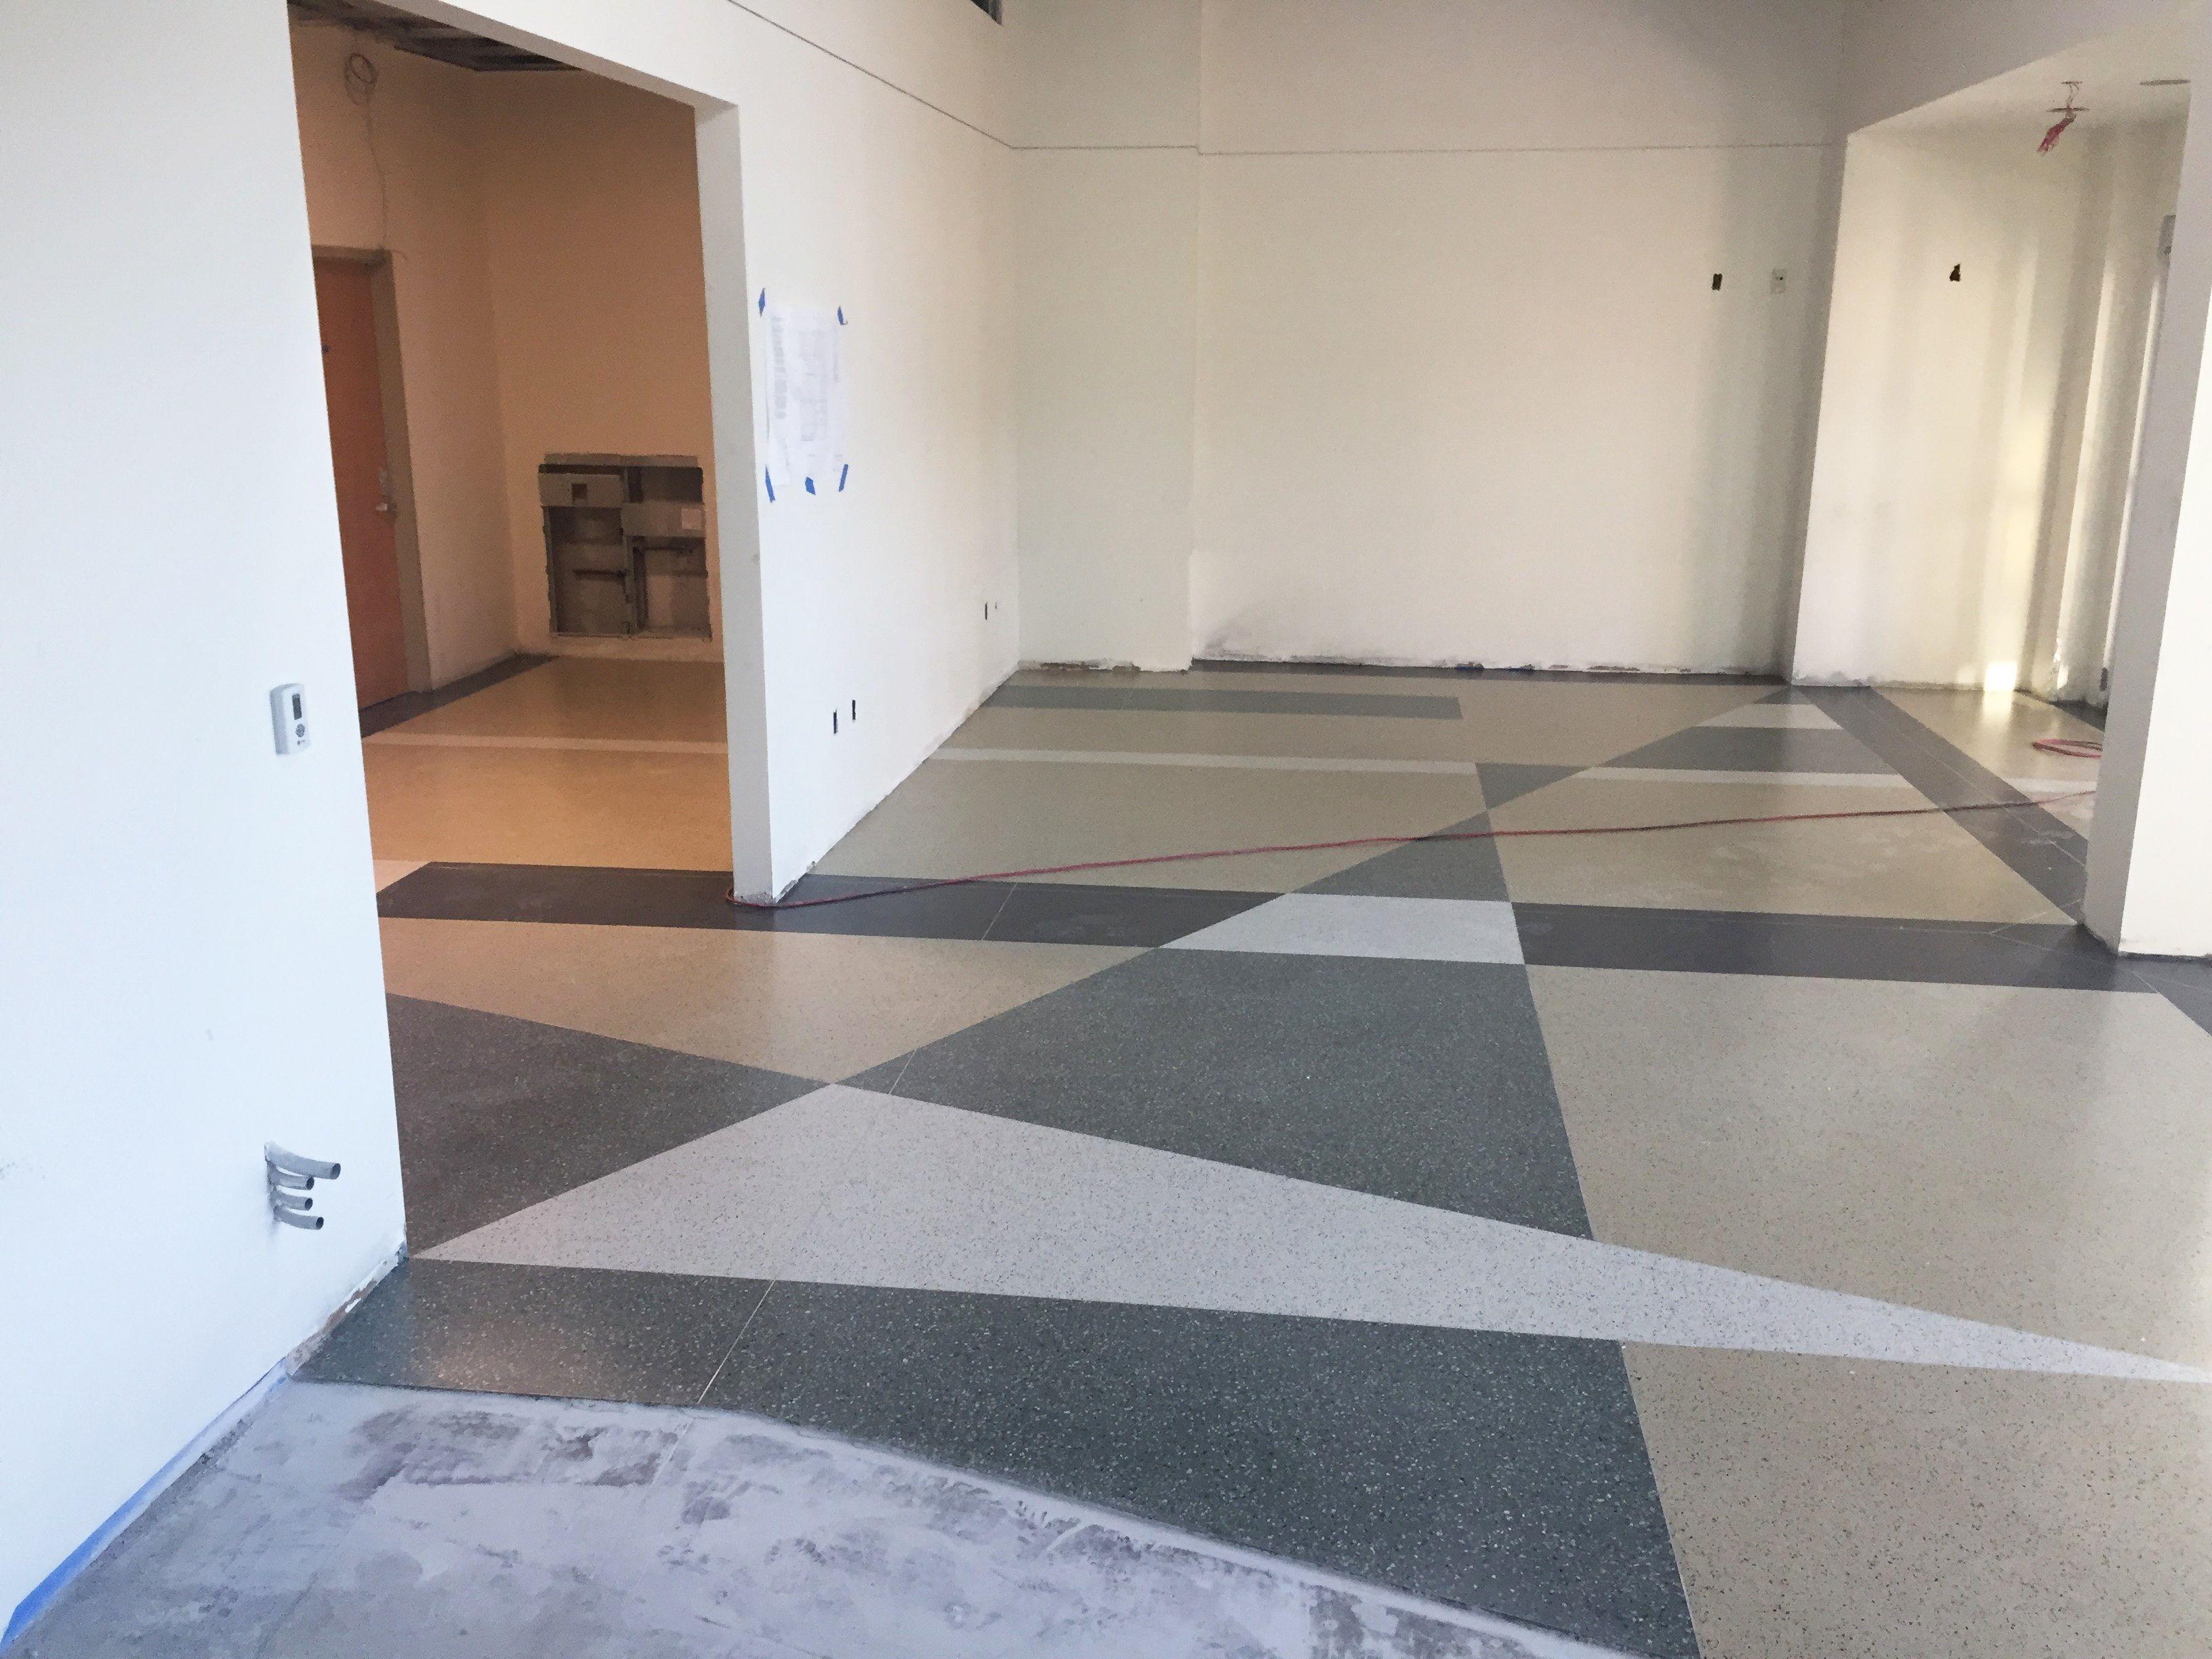 Epoxy Terrazzo Floors At Halifax Health In Florida Www